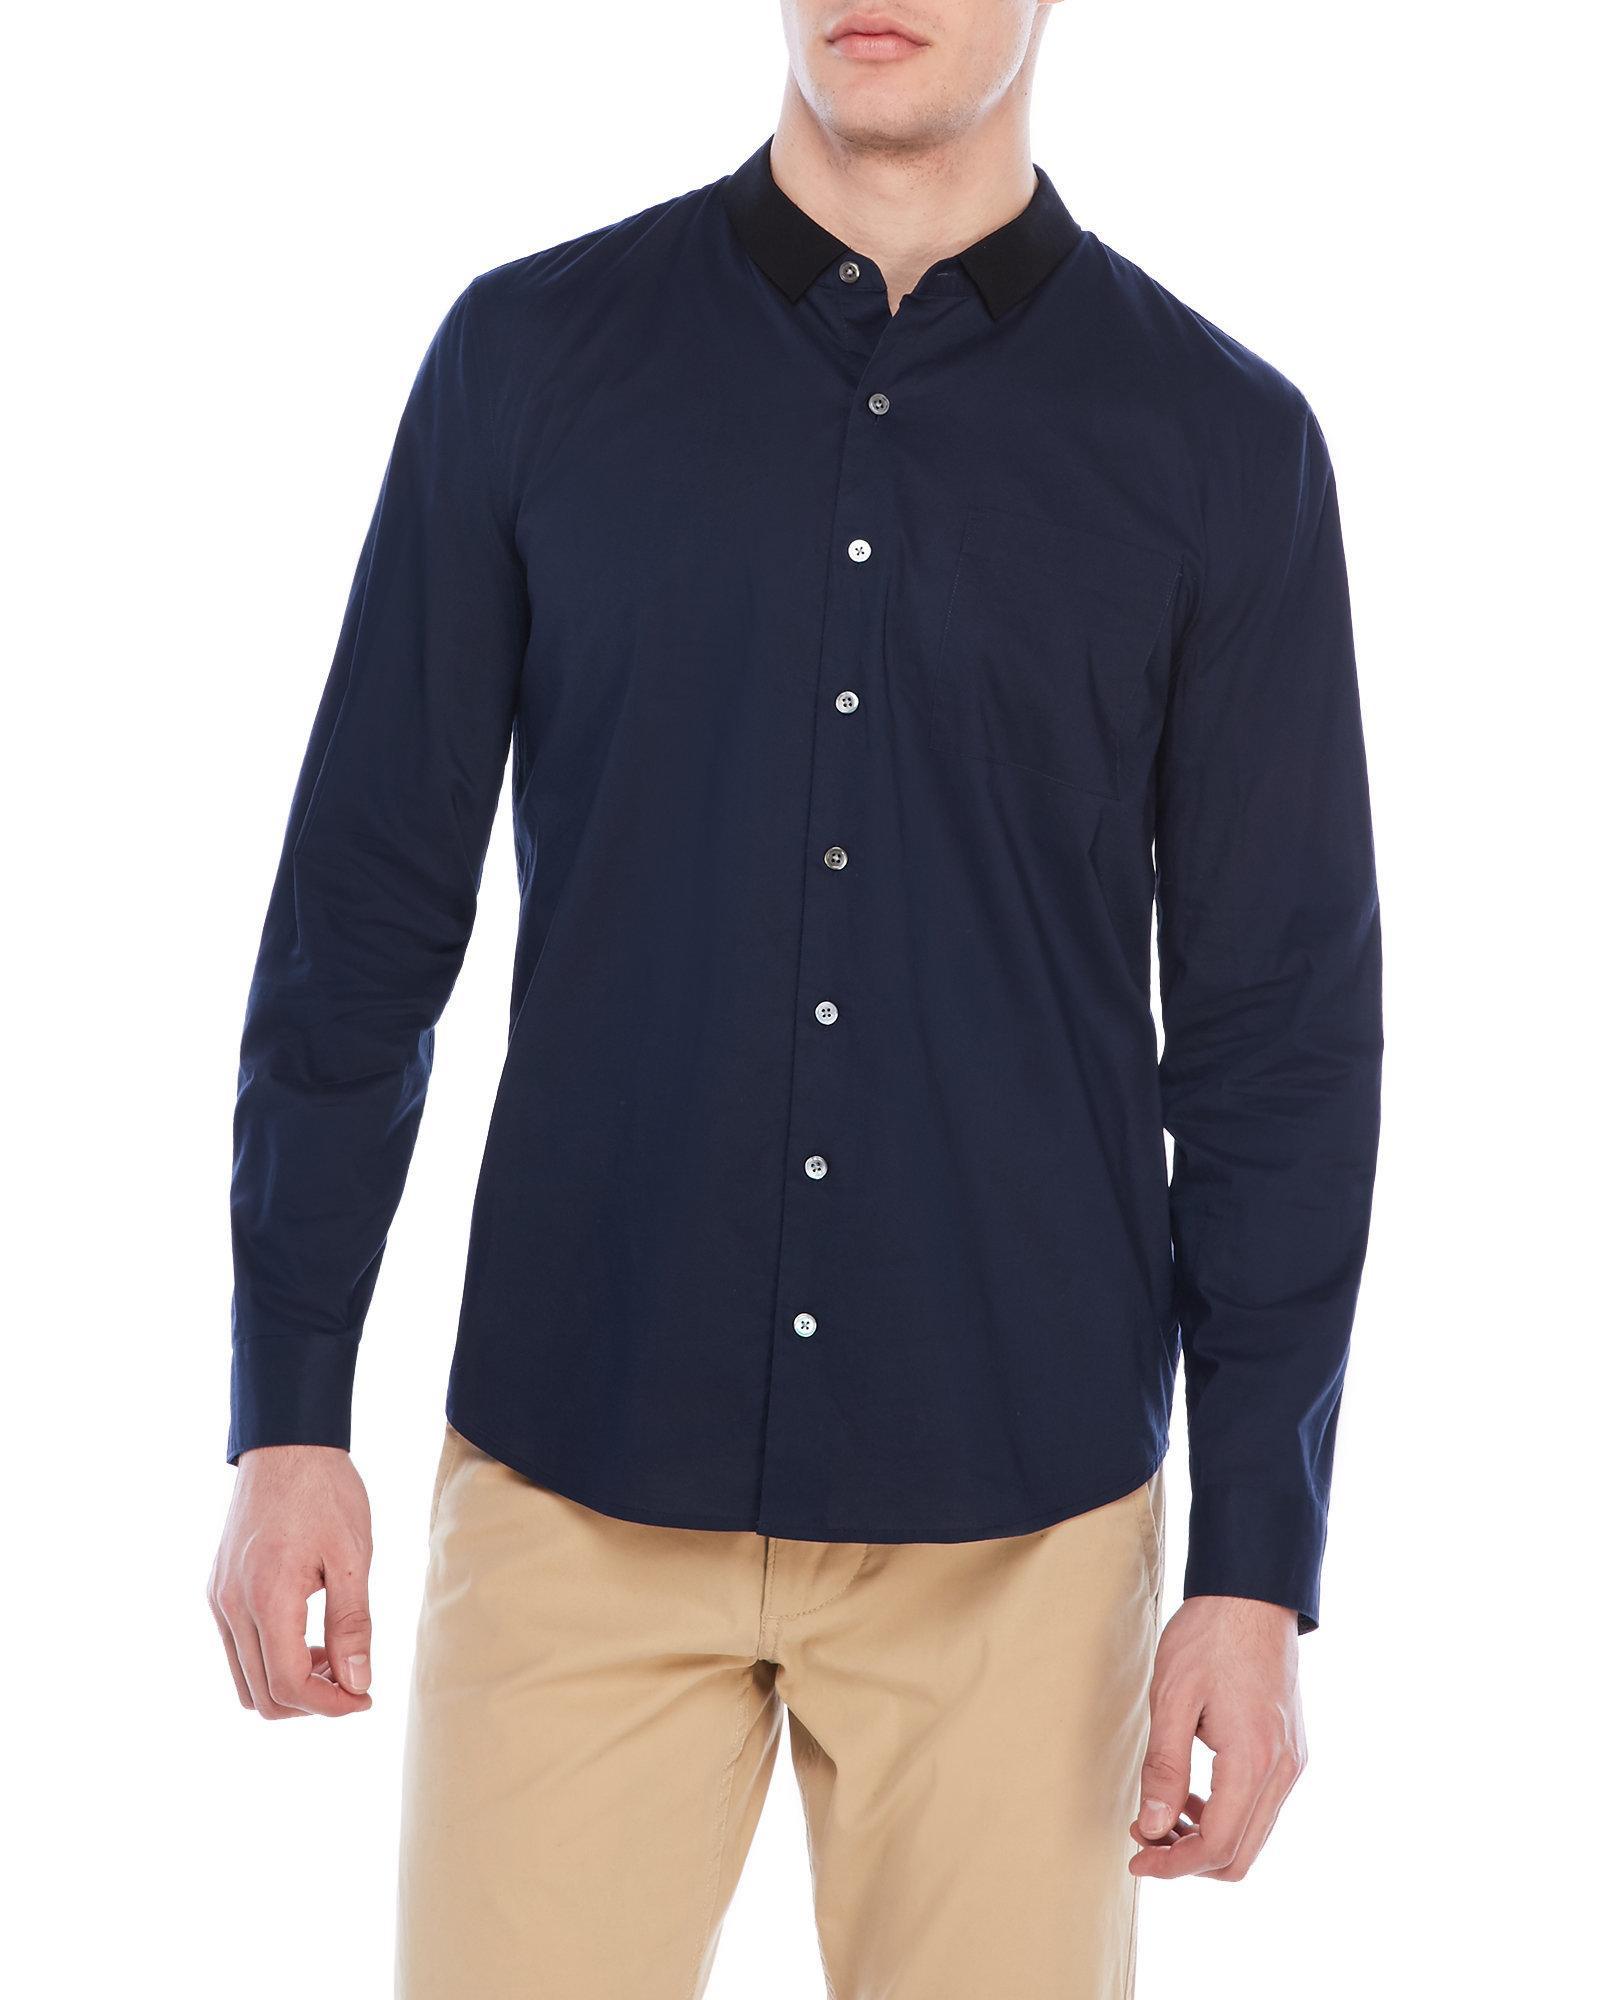 Lyst Atm Grosgrain Collar Dress Shirt In Blue For Men